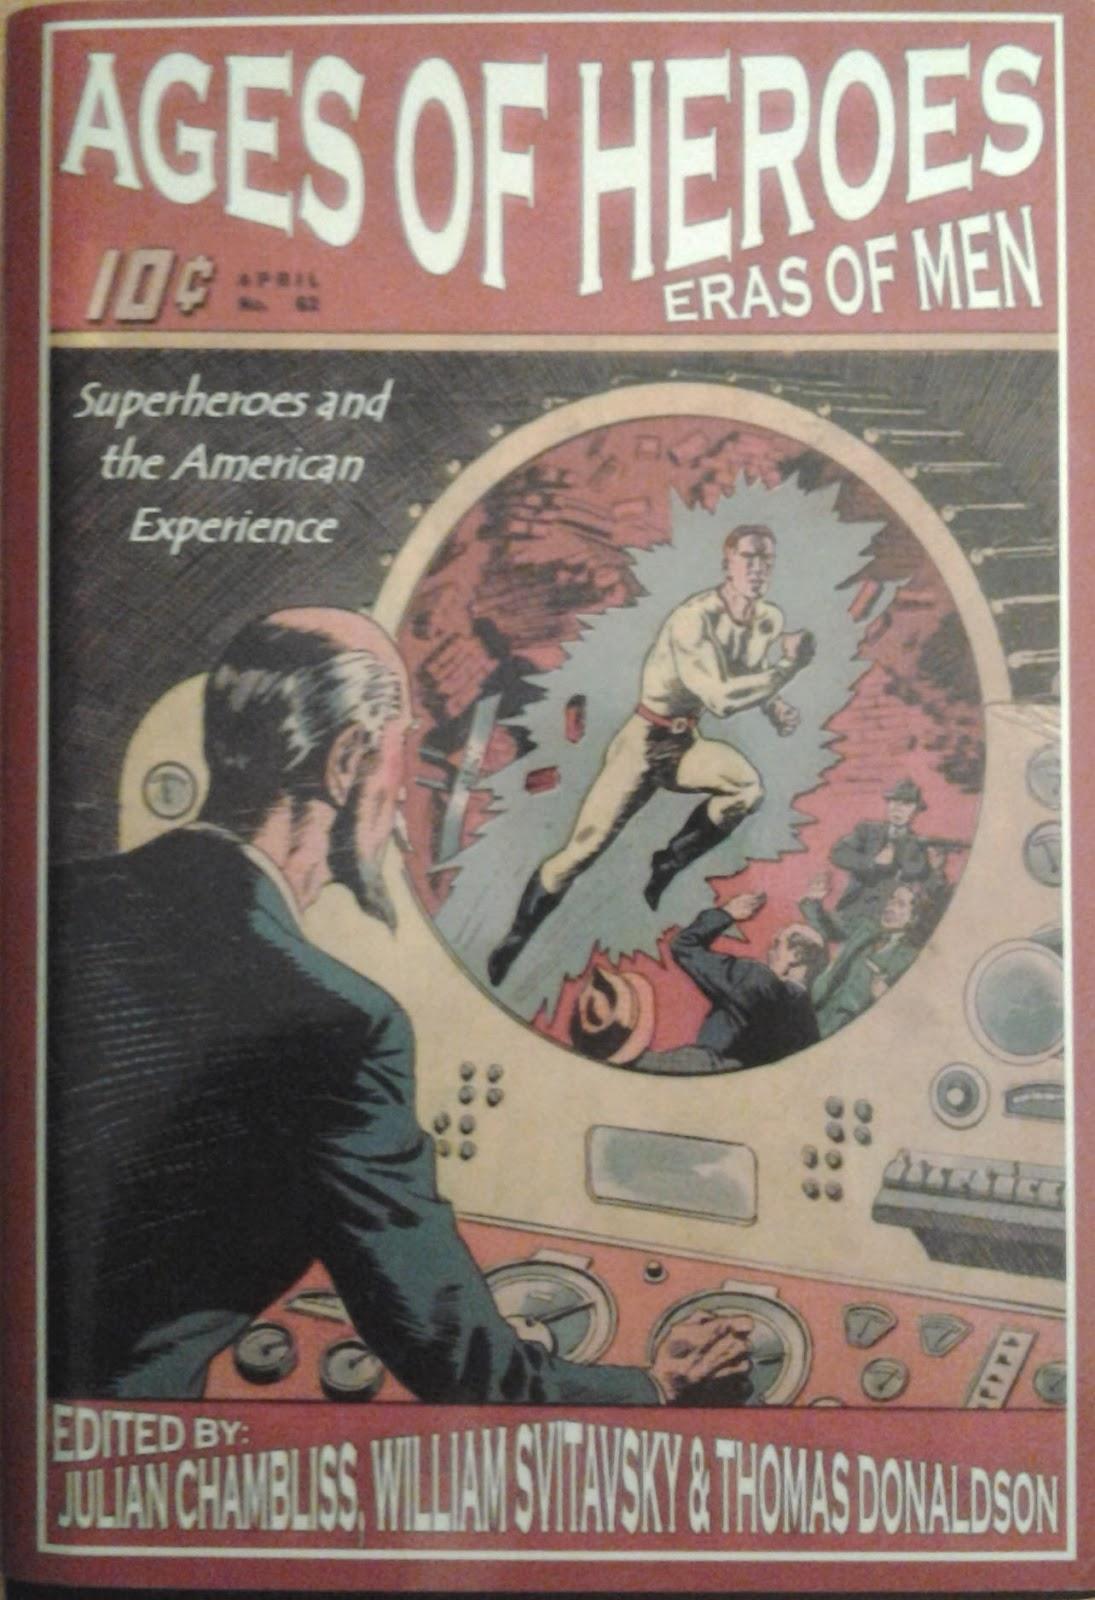 Ages of Heroes, Eras of Men eds. Julian C. Chambliss, Thomas Donaldson, William Svitavsky.  Cambridge Scholars Publishing